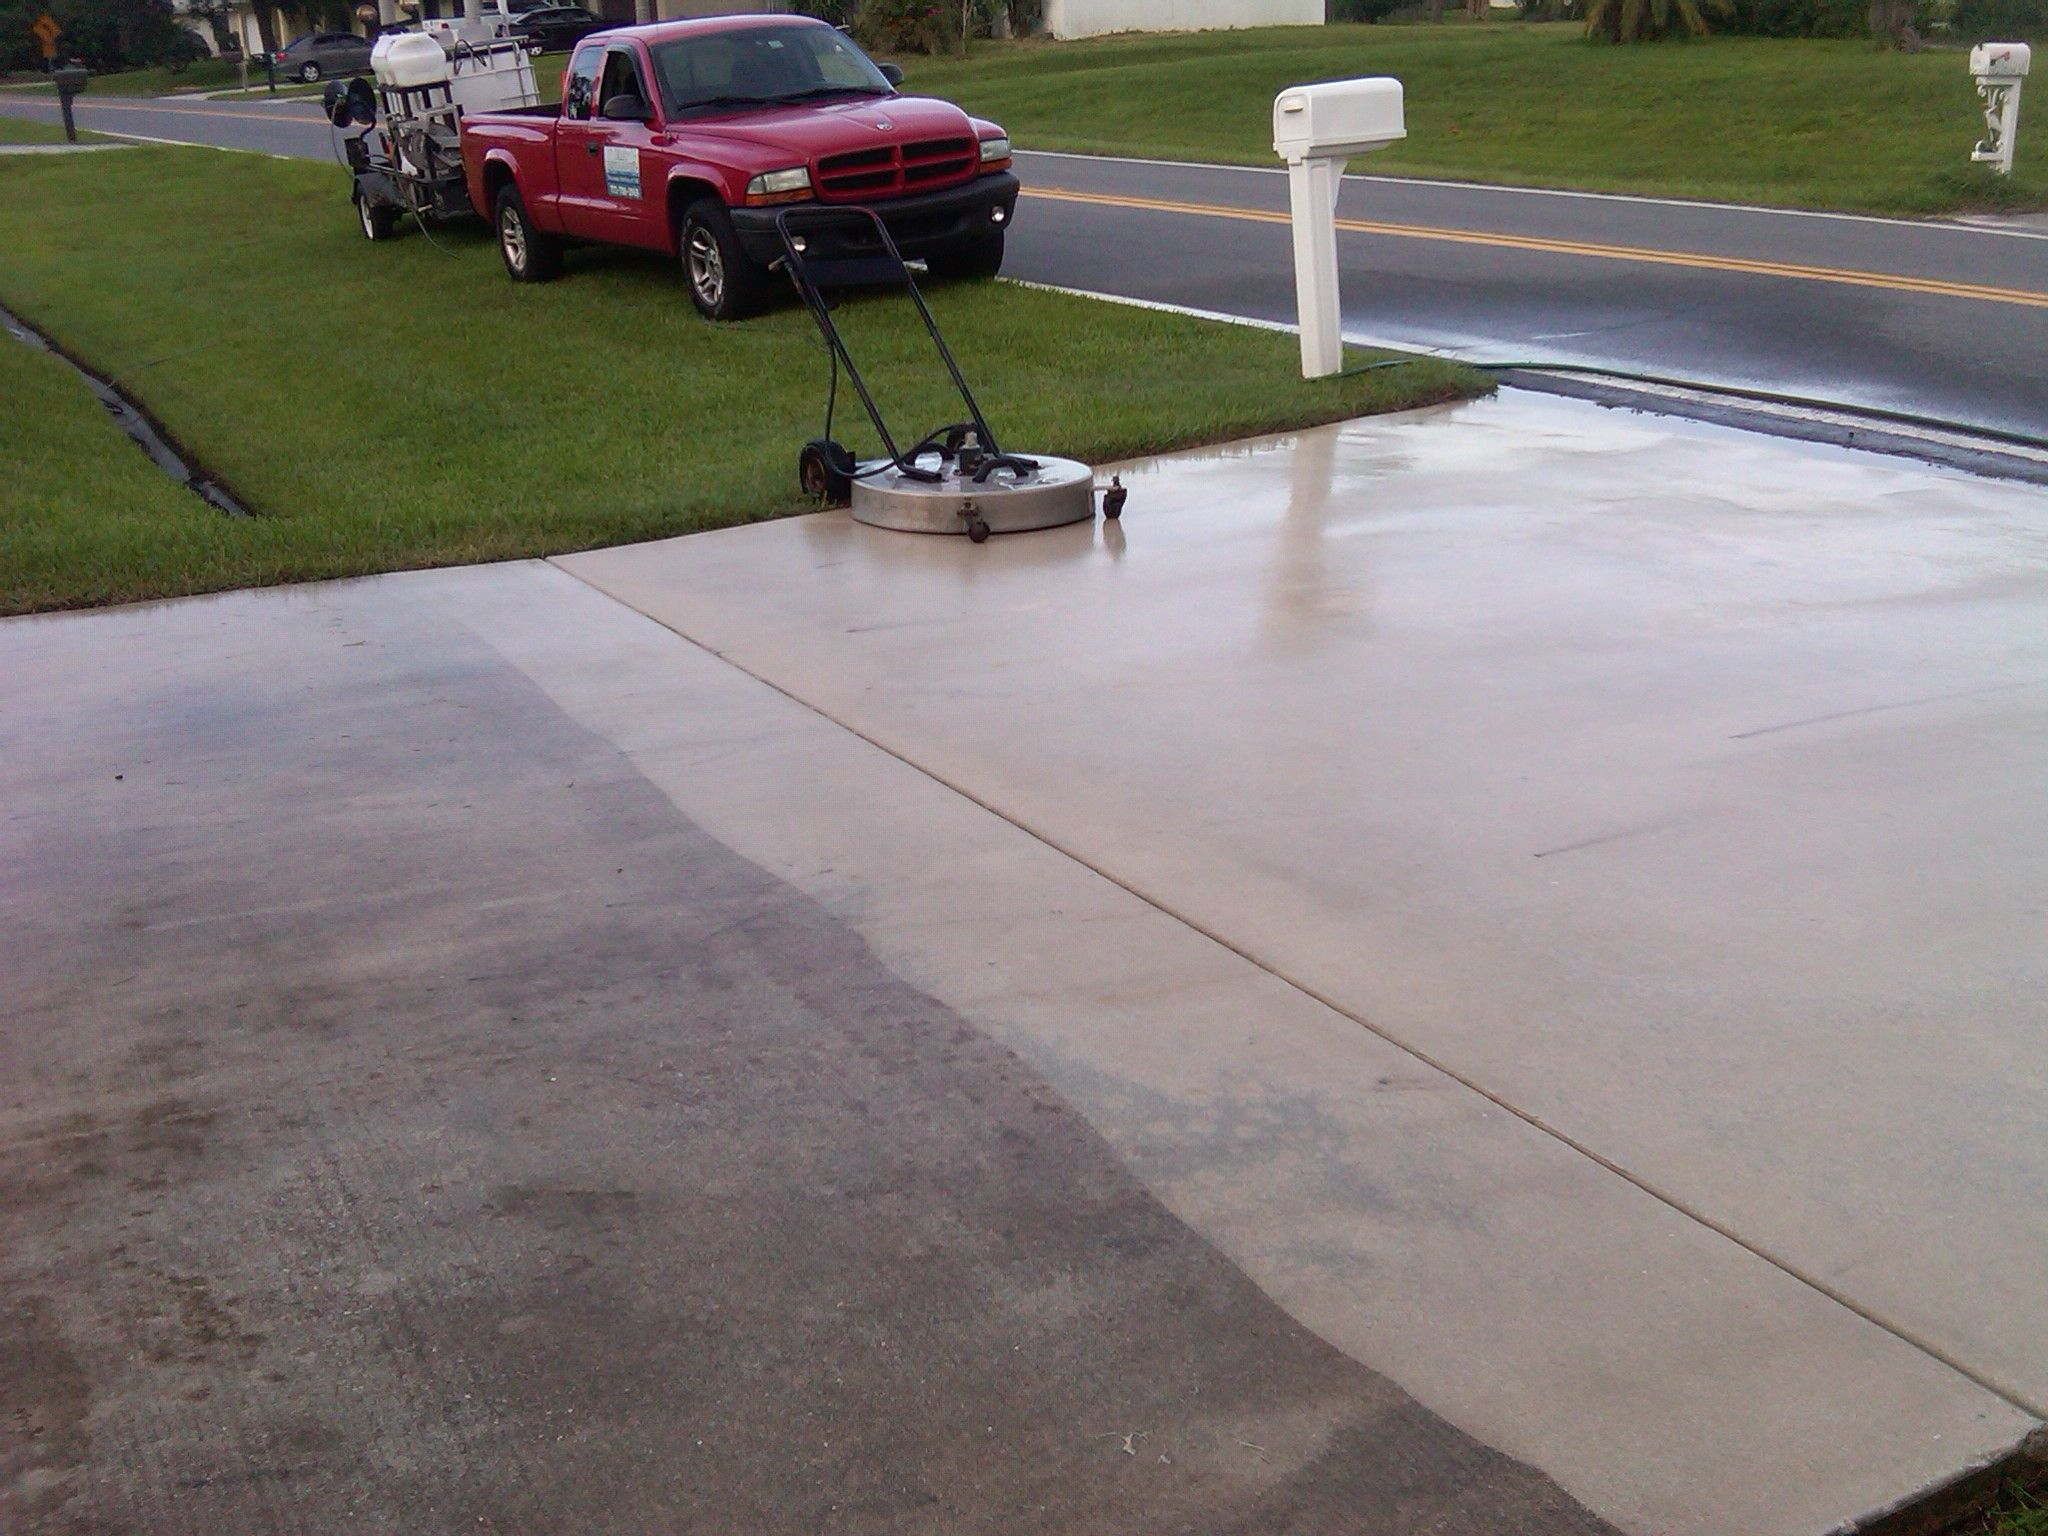 How To Pressure Wash Concrete Driveways Mycoffeepot Org